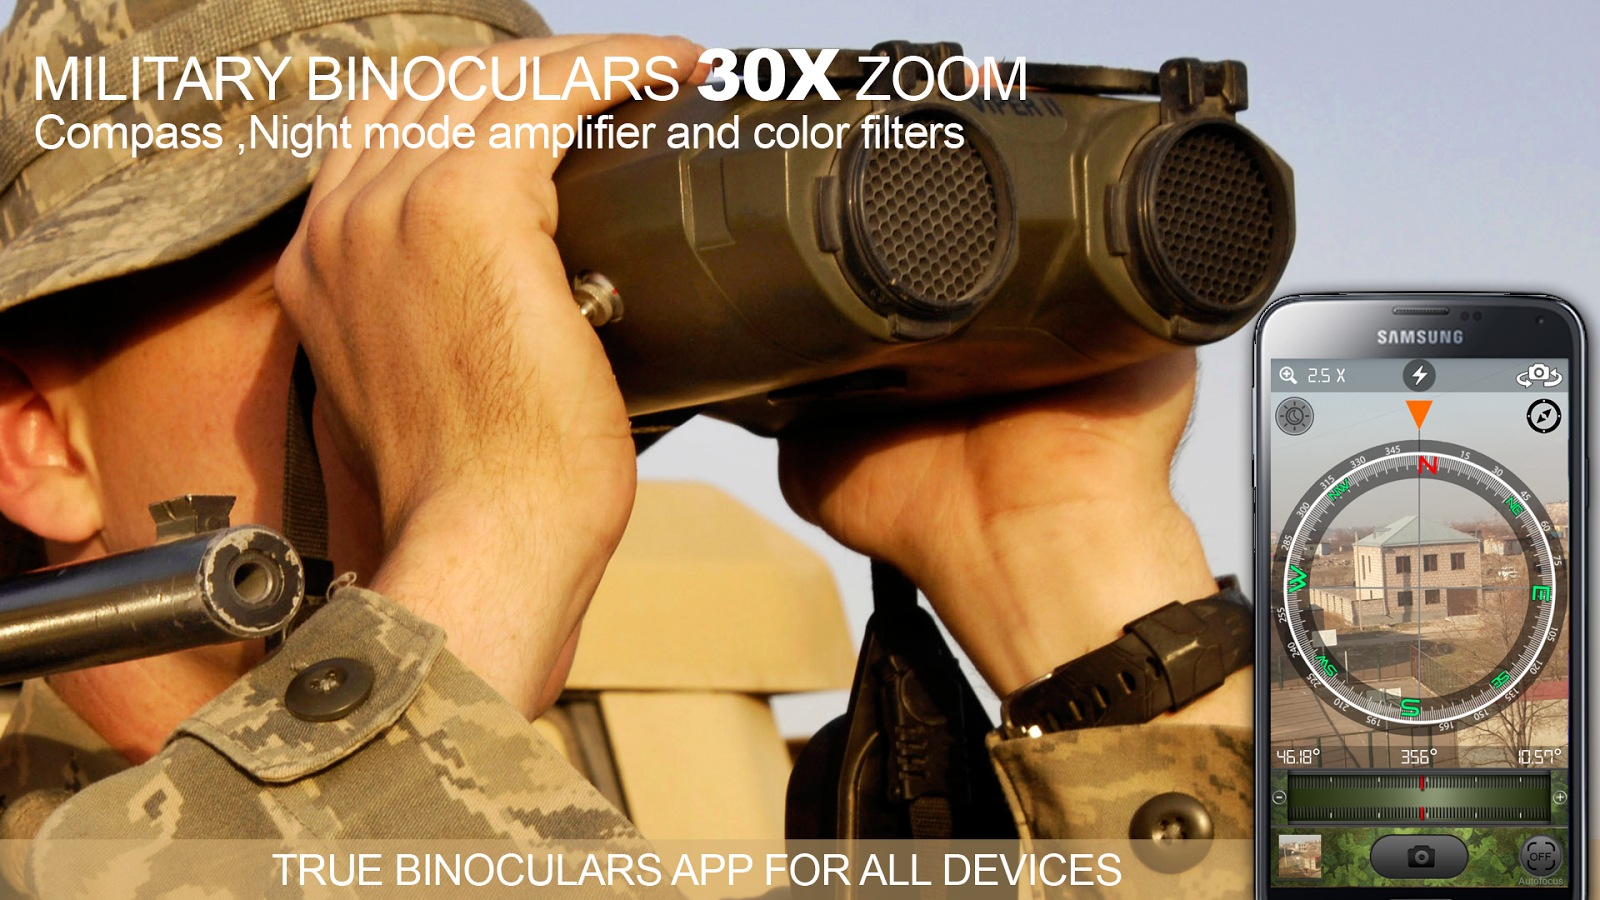 Military Binoculars 30X Zoom-https://lh3.ggpht.com/g-Eip9reInt94KGoXsxpQjkJEexxEL585HmfHoe7n8tWGUmCjhS87sHR3PdFkDkTHx2i=h900